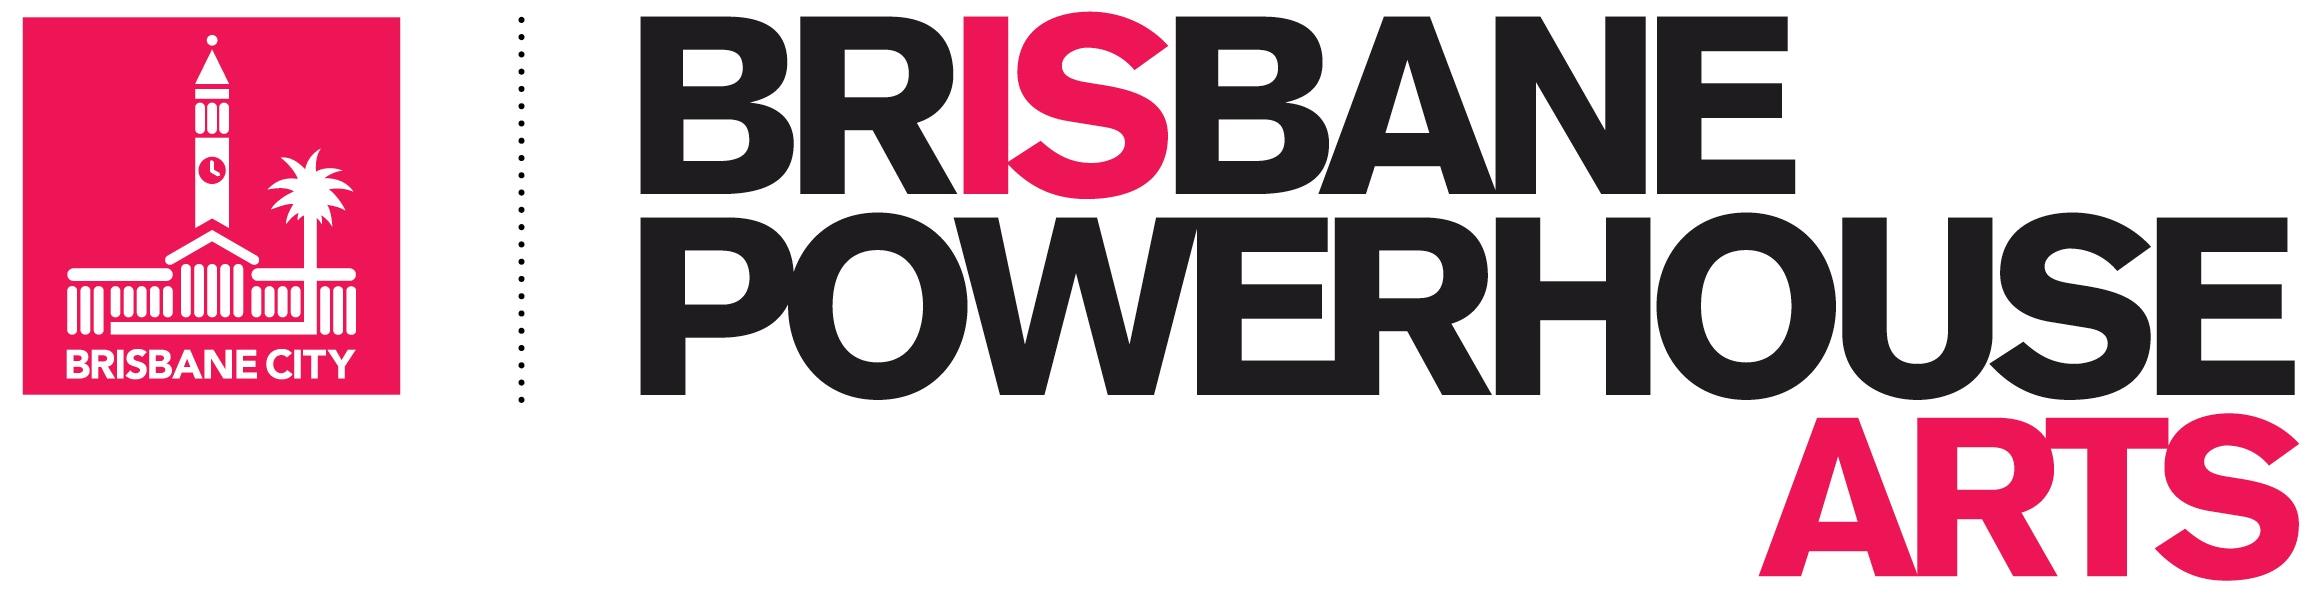 Brisbane-Powerhouse-logo.jpg